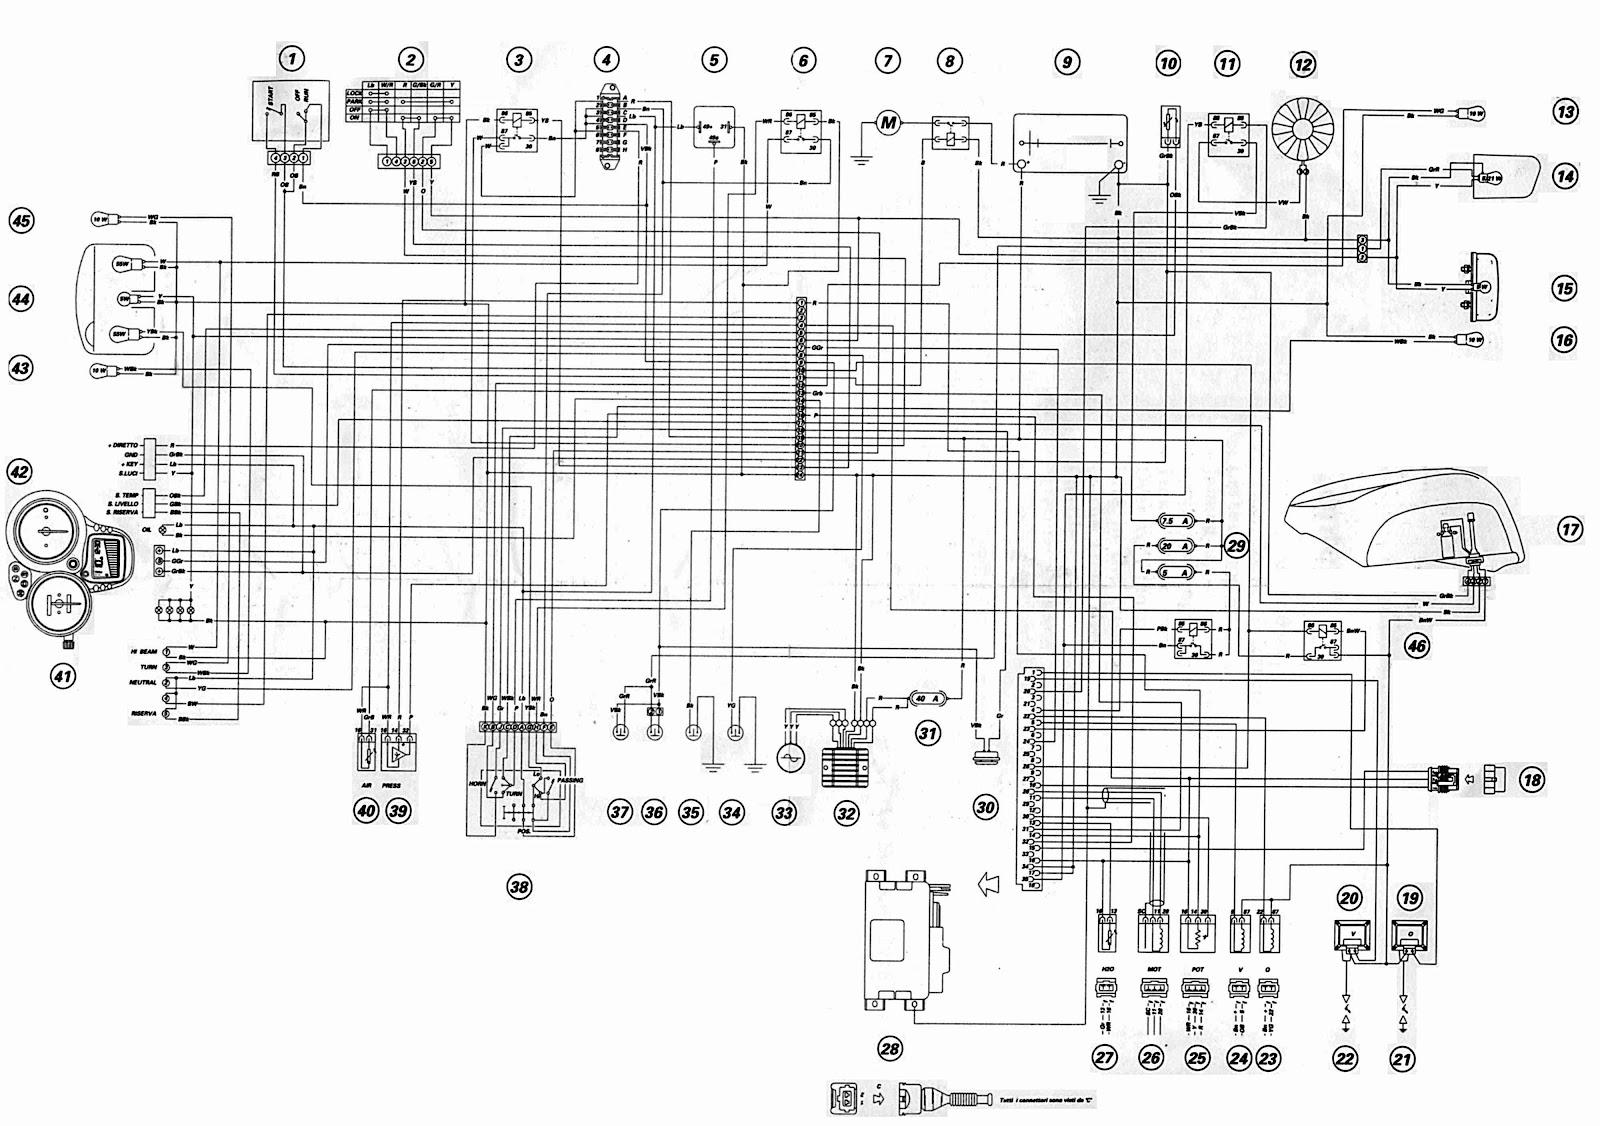 ducati st4 2002 motorcycle wiring diagram ducati st4 suzuki quadrunner 160  [ 1600 x 1126 Pixel ]